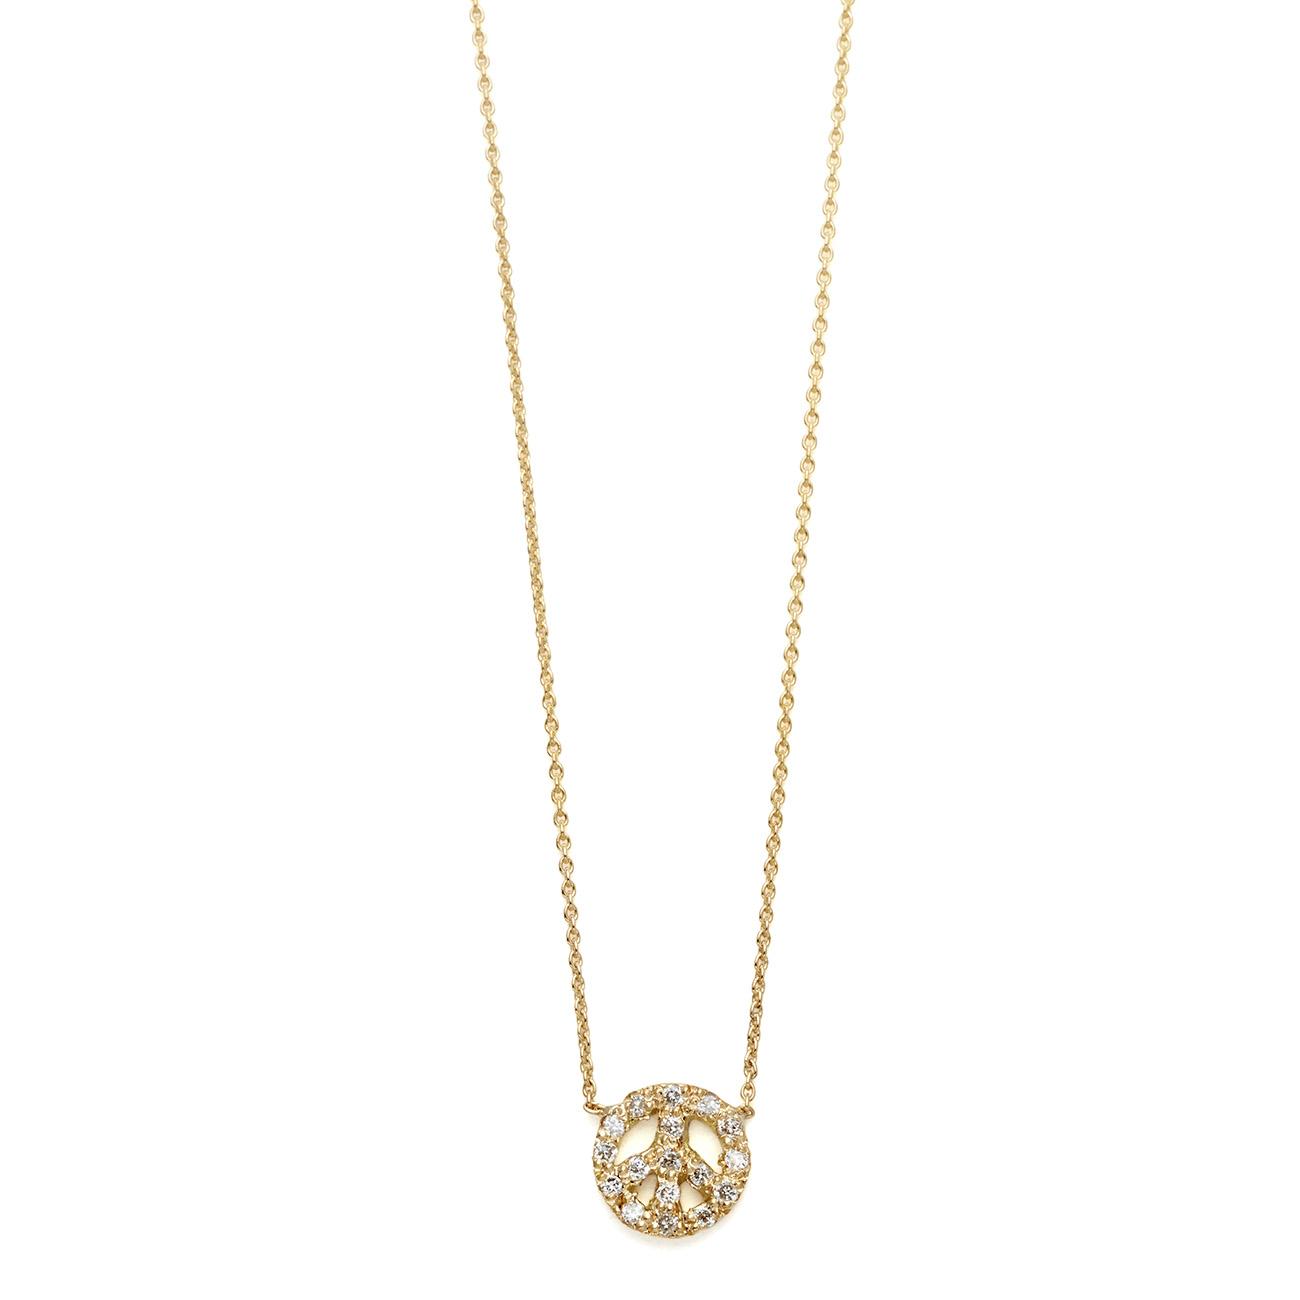 Diamond peace sign necklace elisa solomon jewelry yellow gold diamond tiny peace sign necklace mozeypictures Choice Image